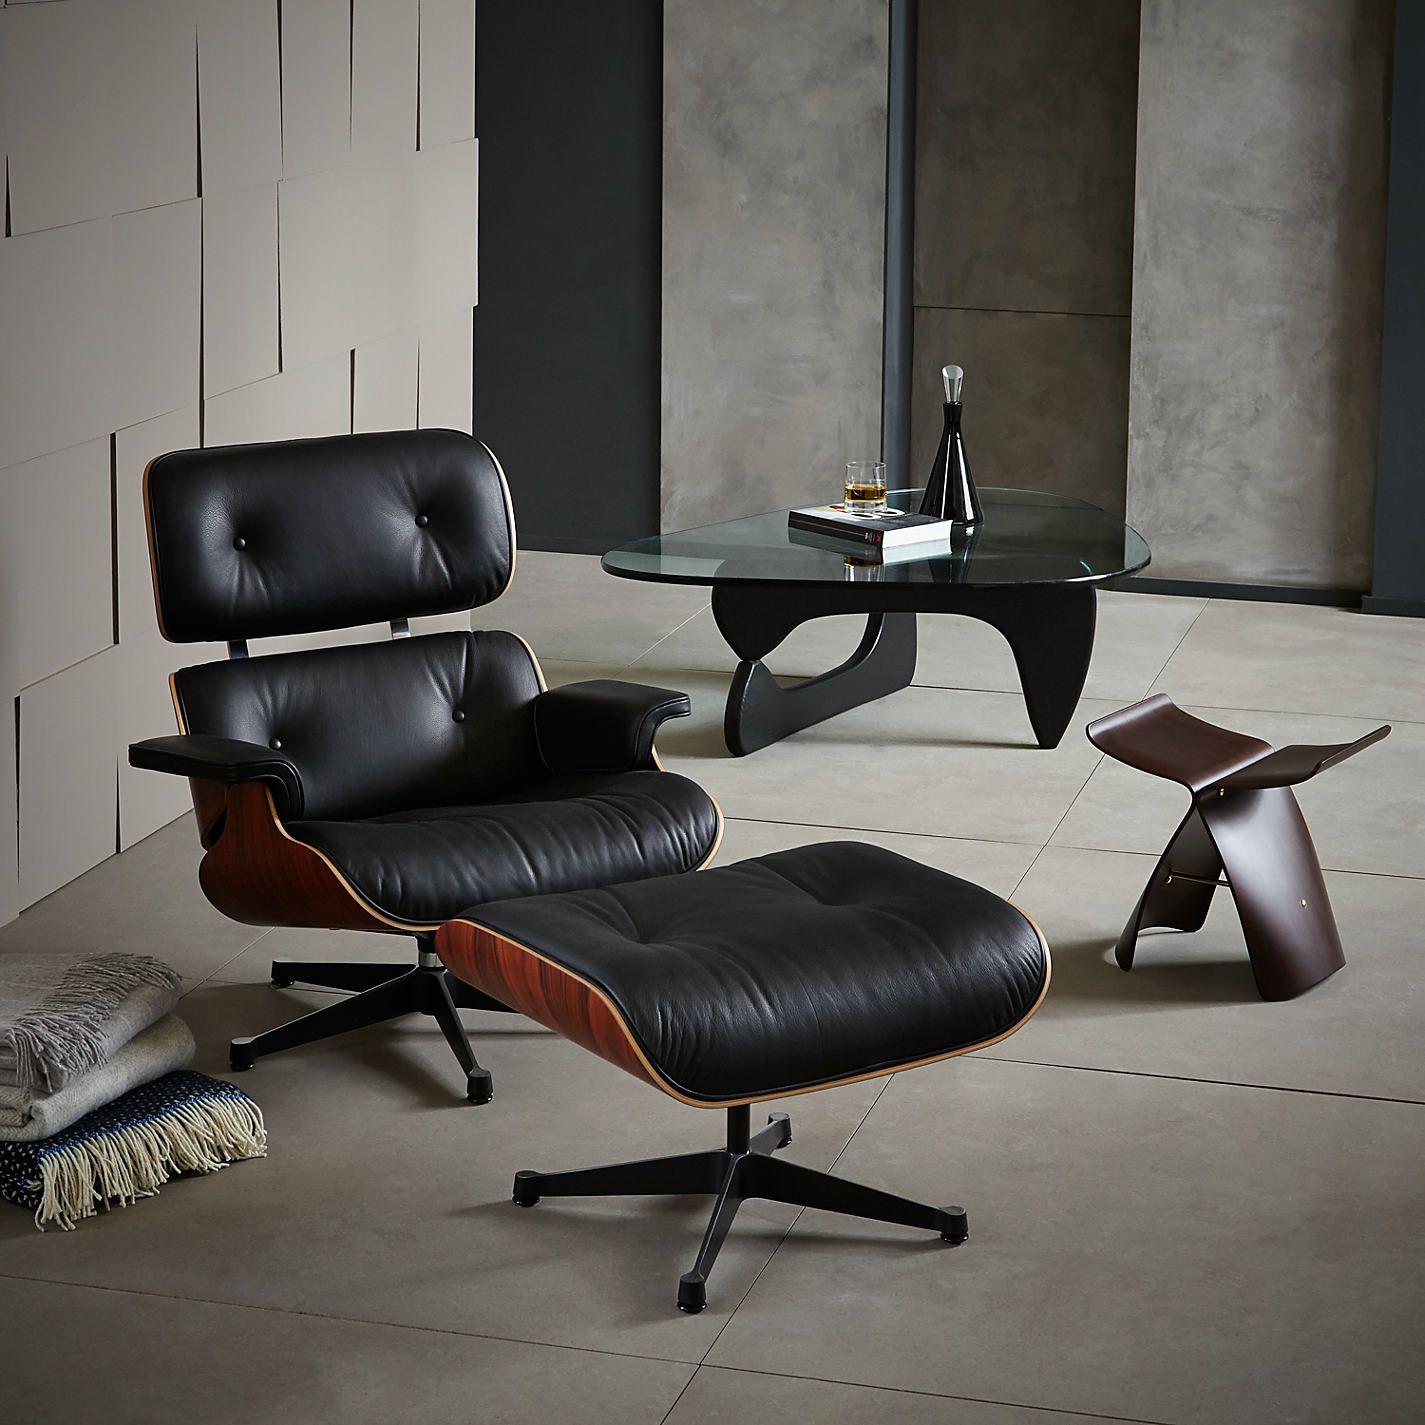 noguchi coffee table Kaffeetisch Eames sessel, Lounge